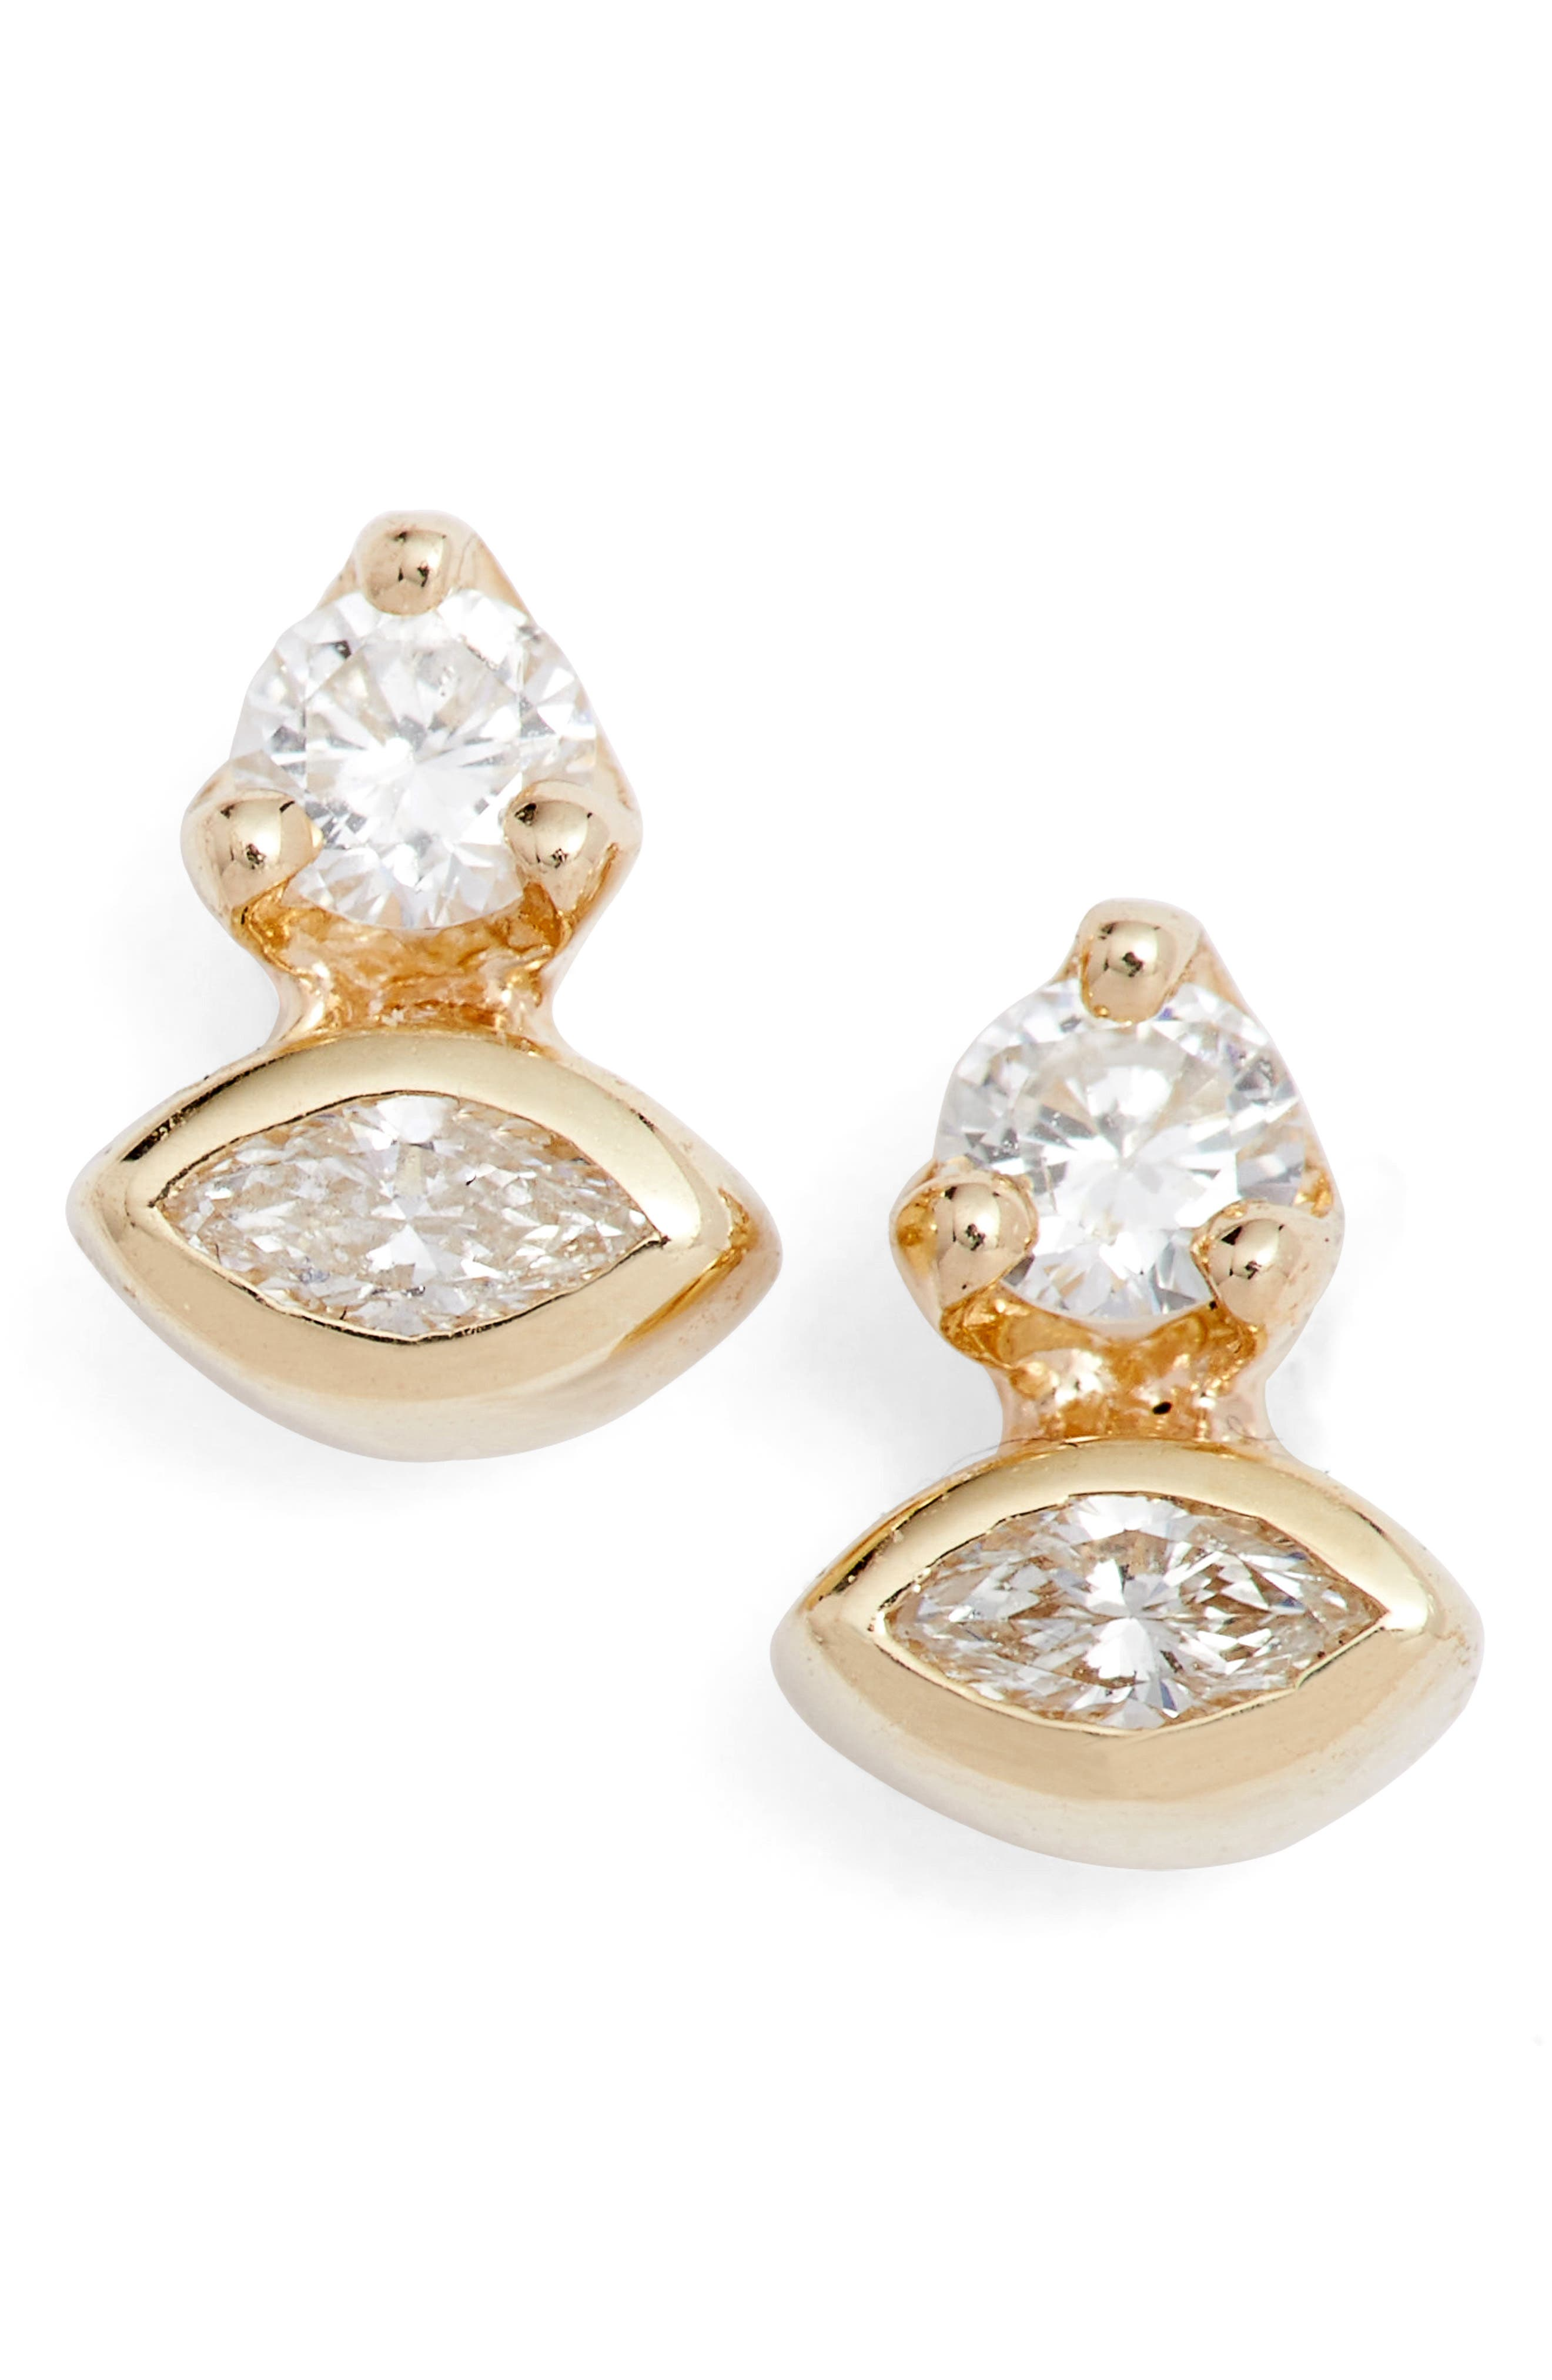 Alternate Image 1 Selected - Zoë Chicco Diamond Cluster Stud Earrings (Nordstrom Exclusive)